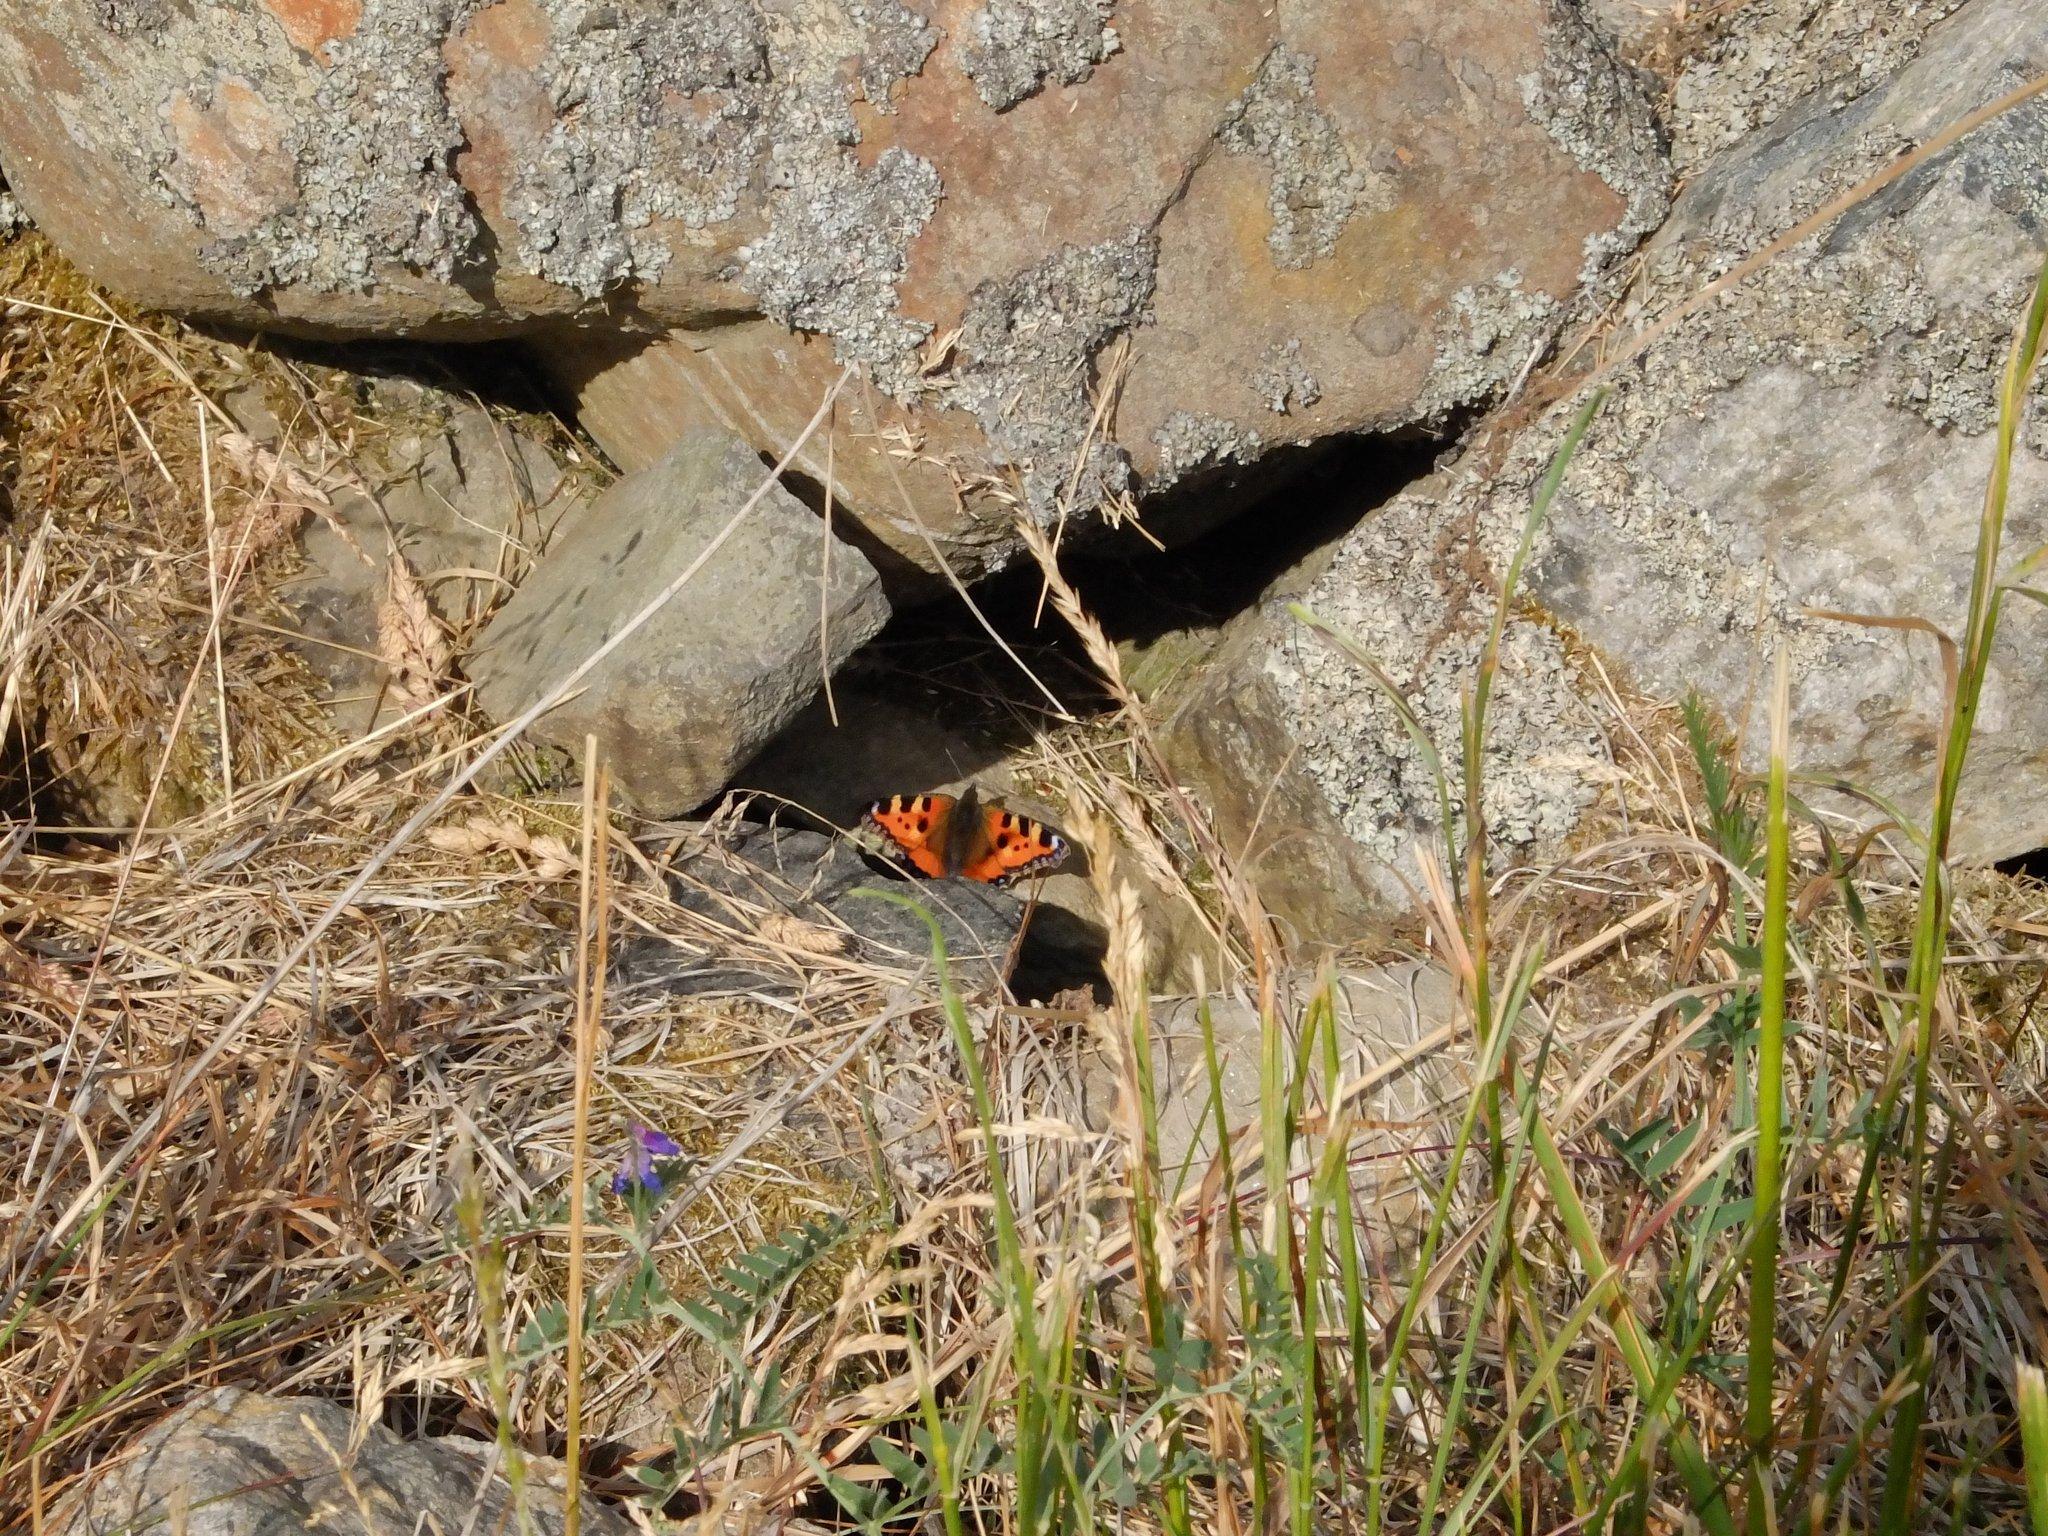 Sunbathing Small Tortoiseshell Butterfly by Alison